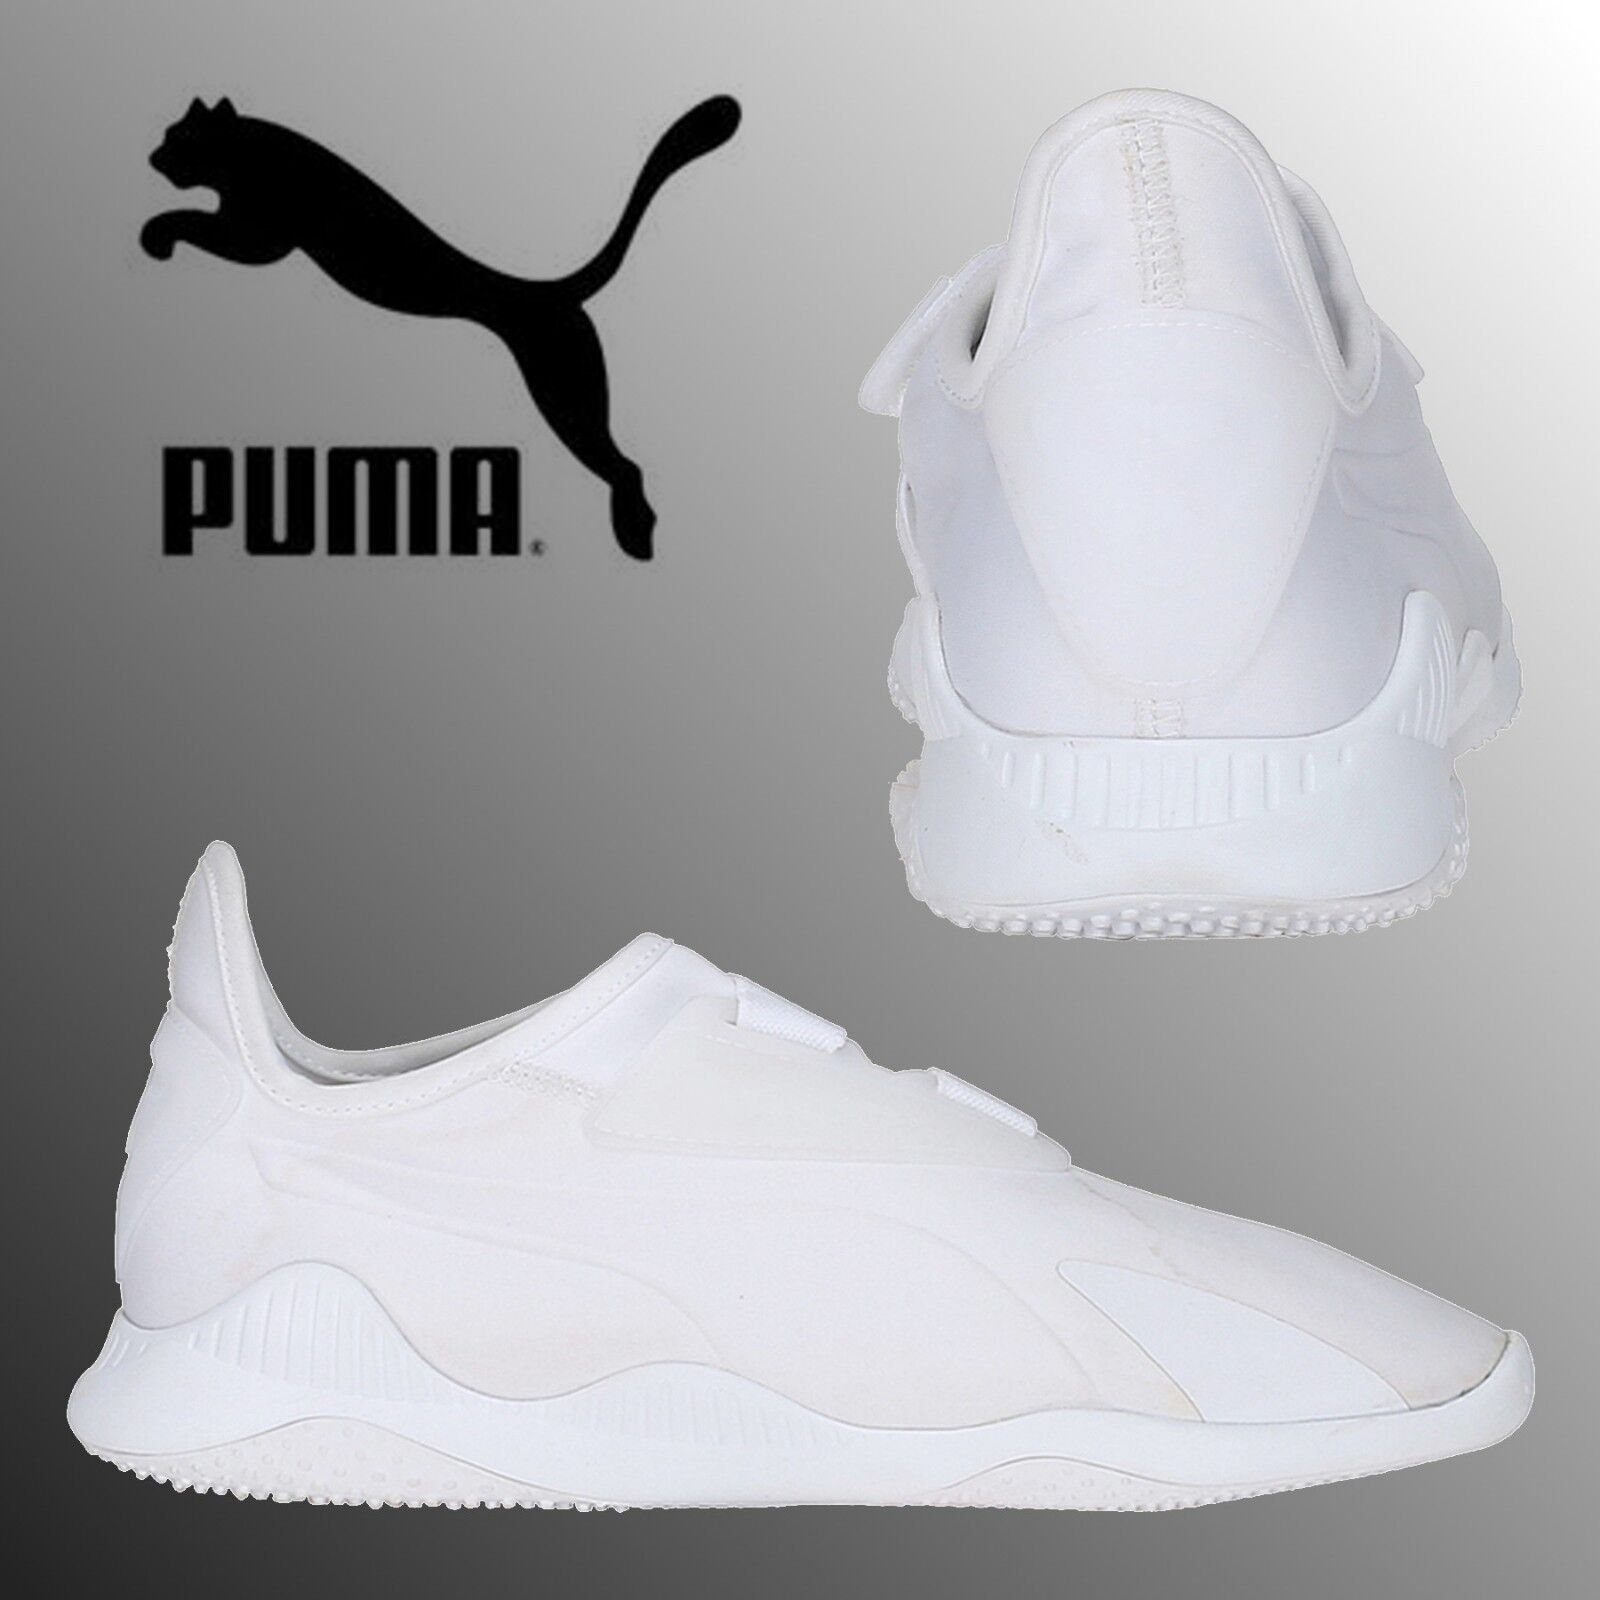 puma evolution